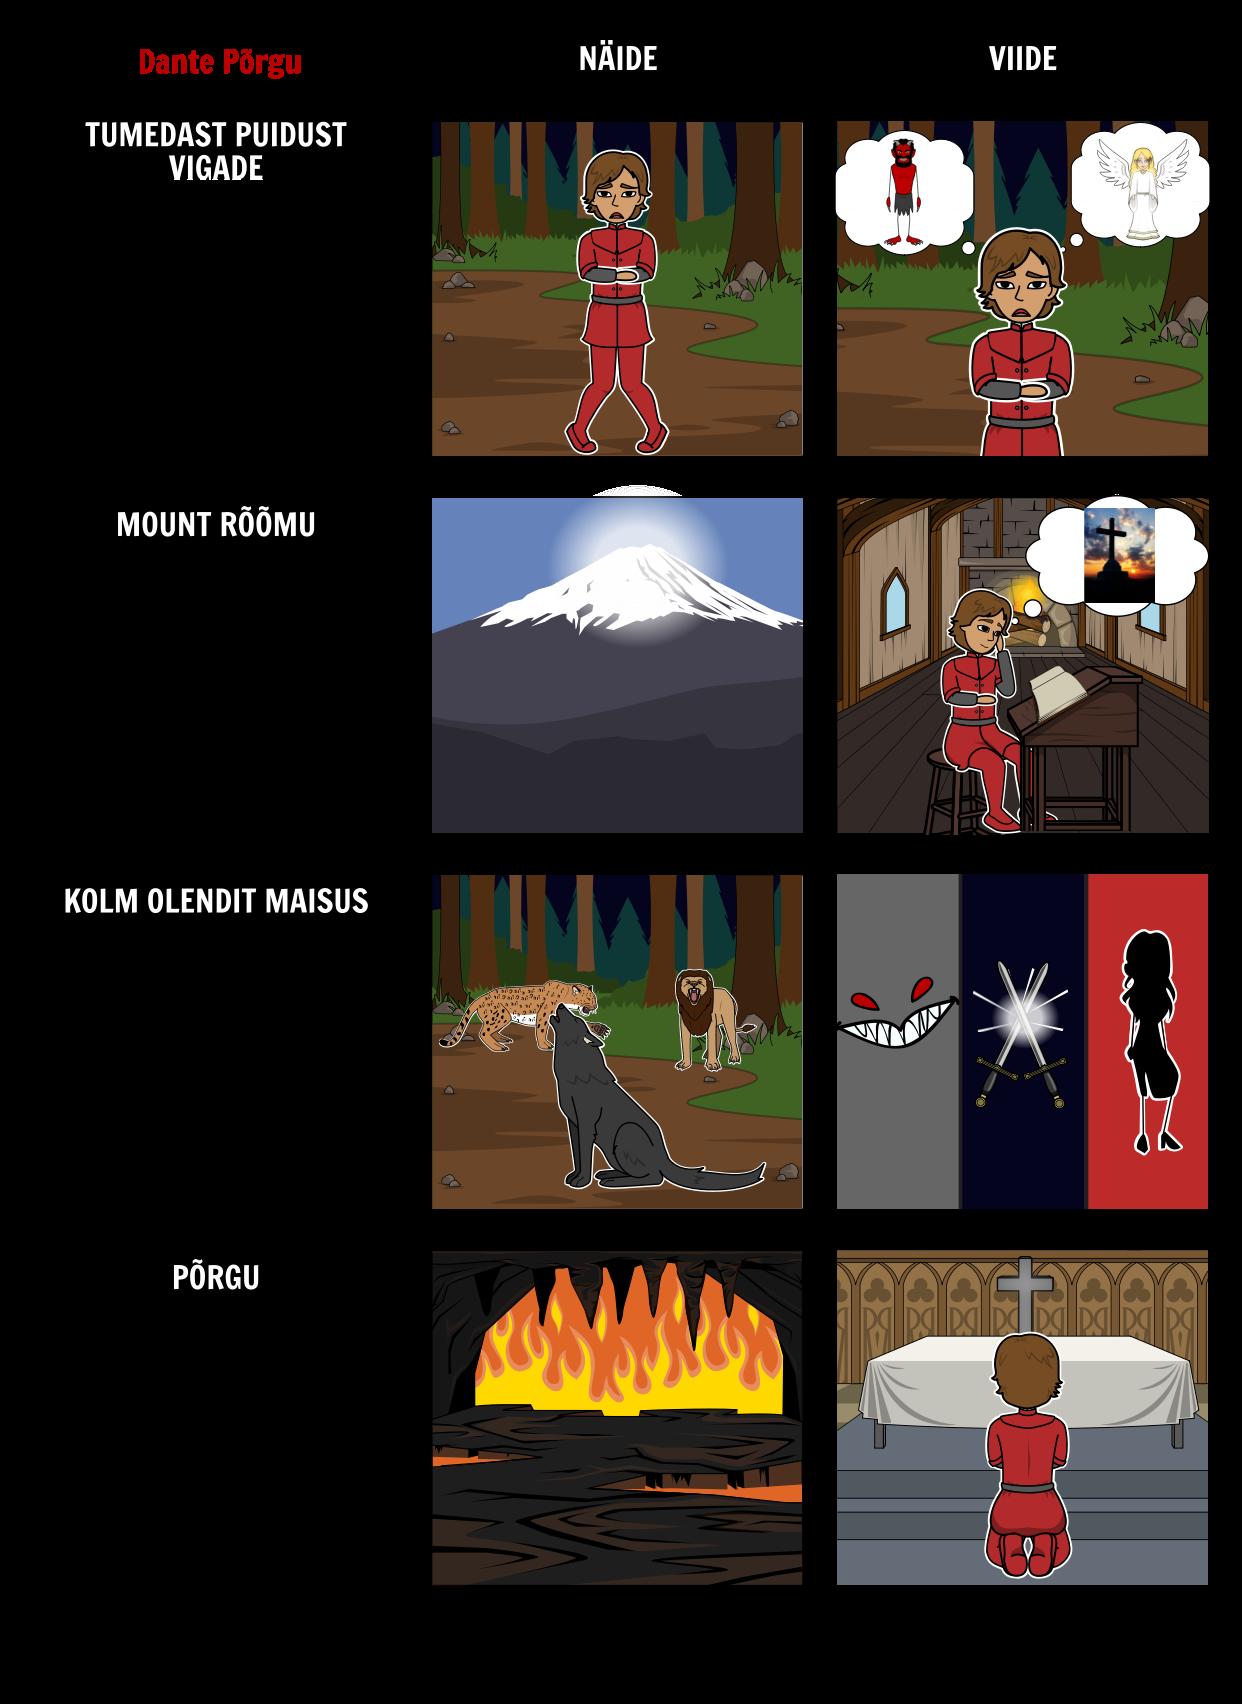 Dante Inferno - Tunnustamine Allegooria